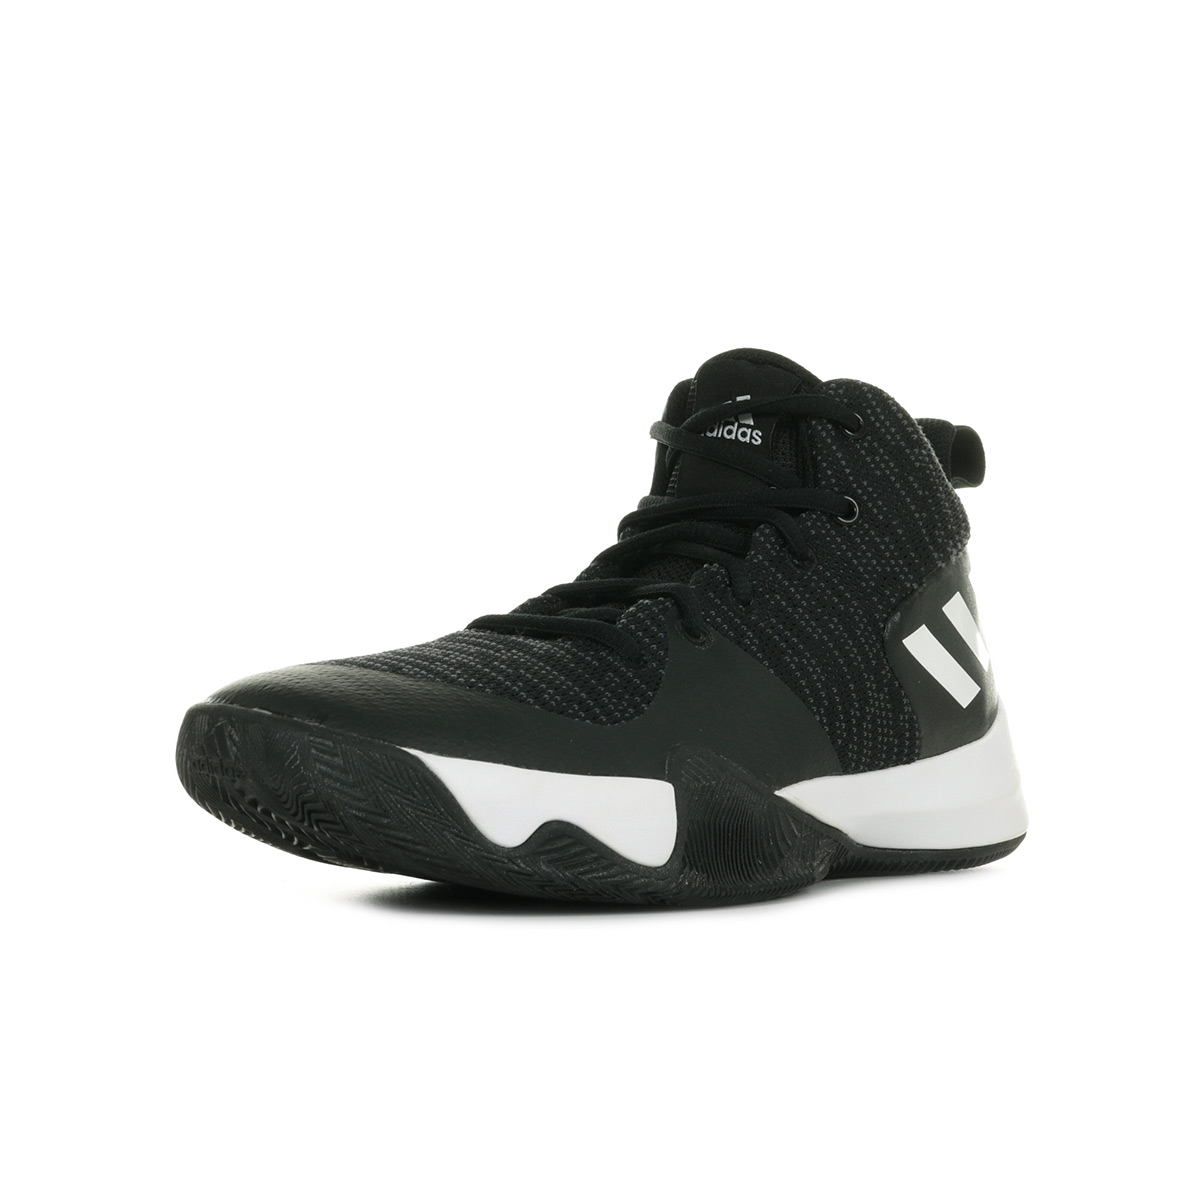 adidas Performance Explosive Flash CQ0427, Basketball homme